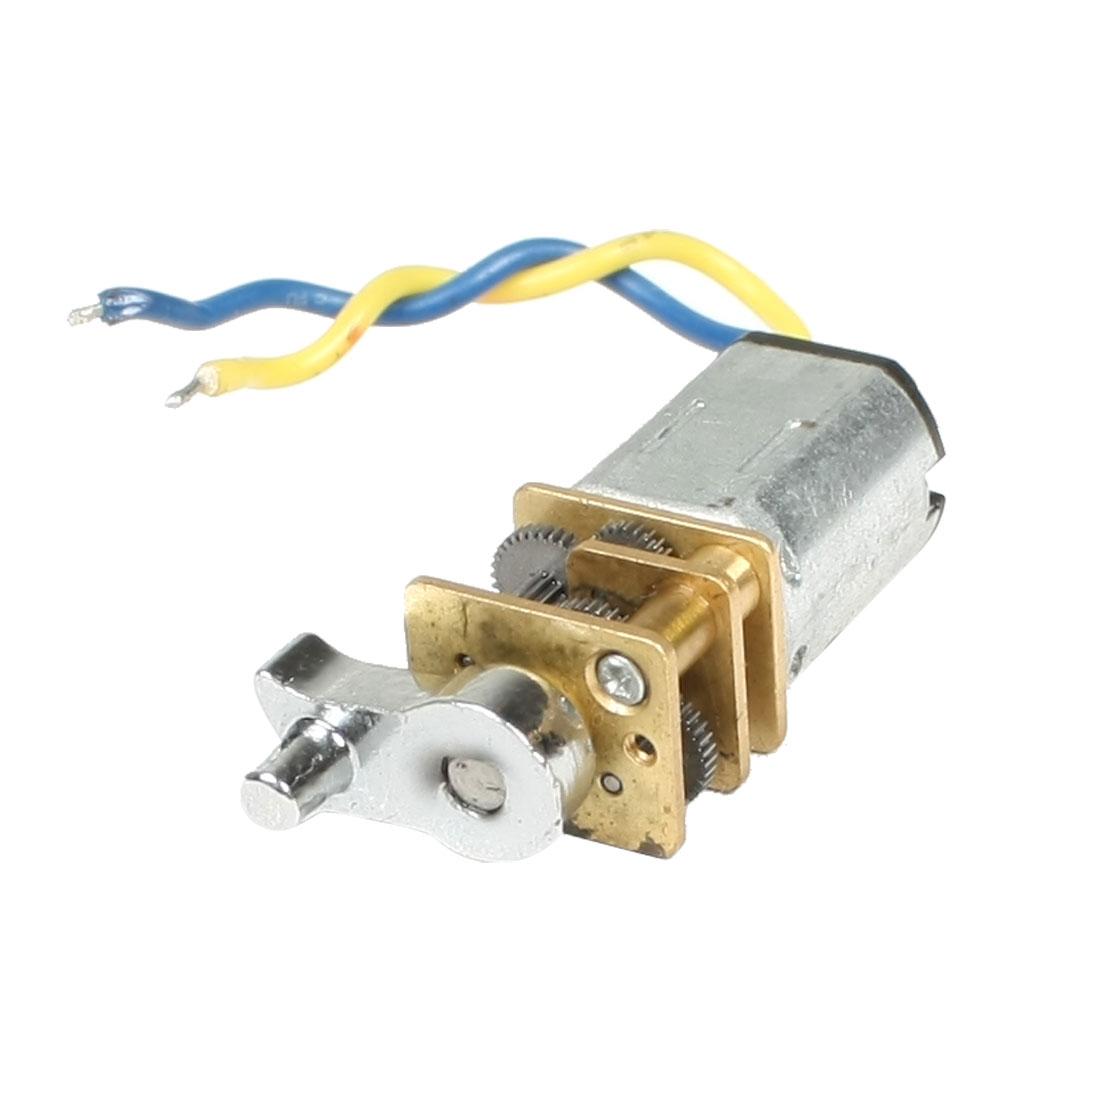 DC 12V 40RPM Rotary Speed Flat Shape Electric Mini Gear Motor N30